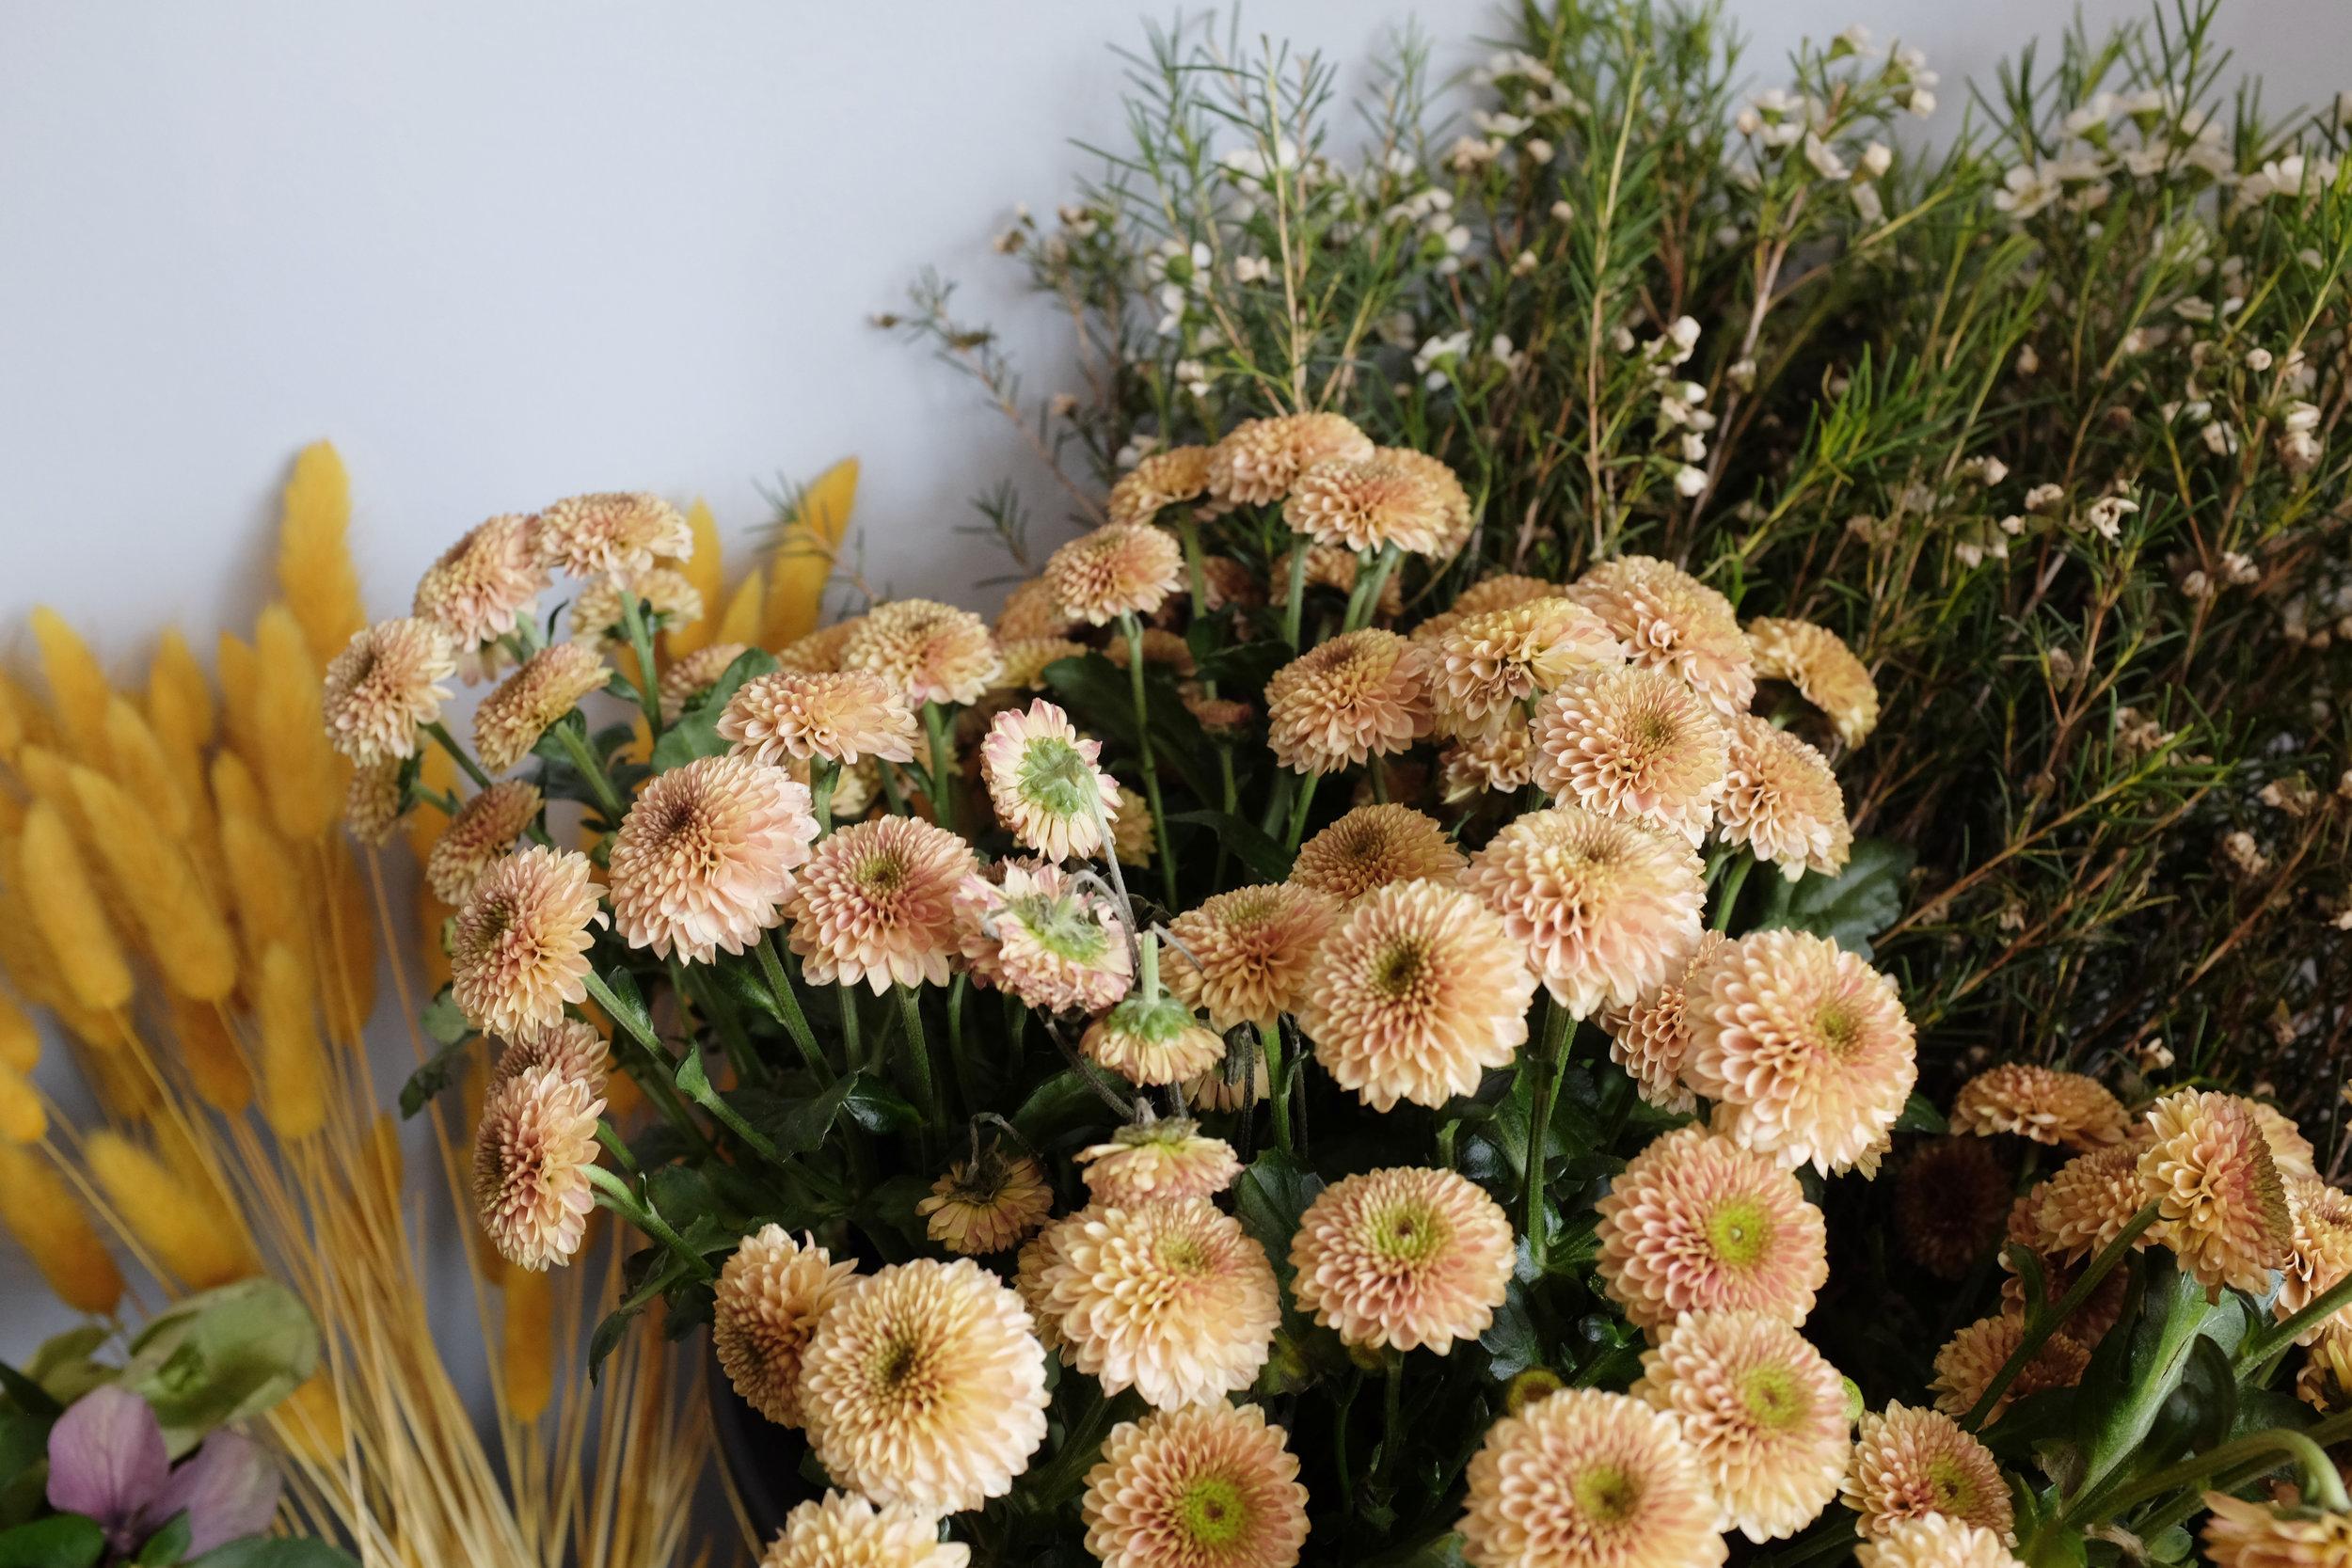 flower_arranging04.jpg